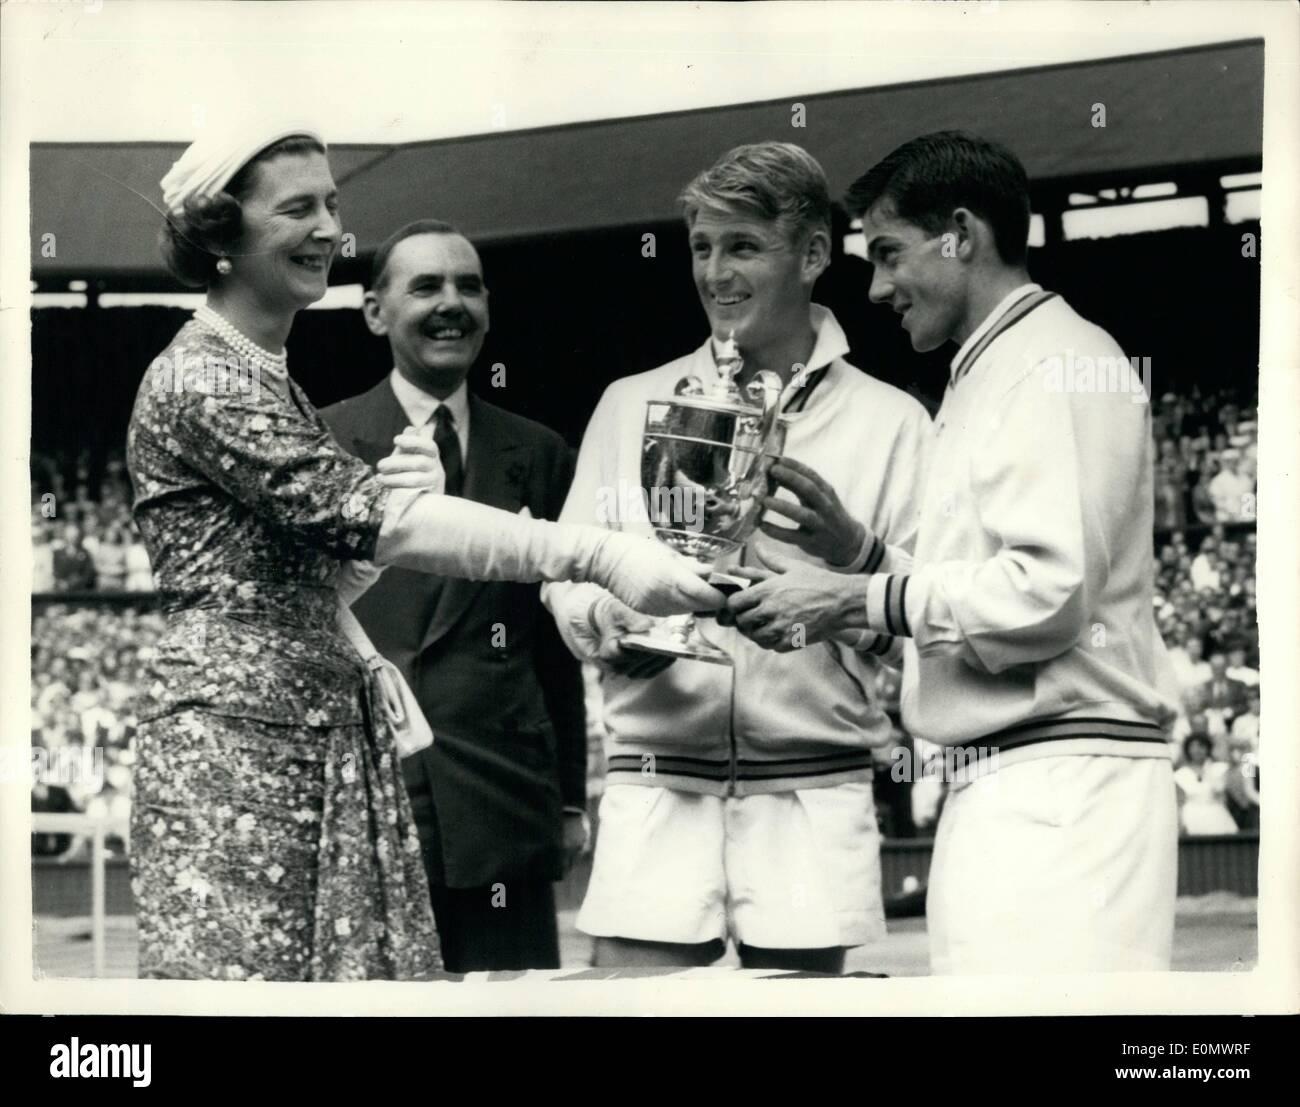 Jul 07 1956 Lew Hoad Wins Men s Singles Championships recevies